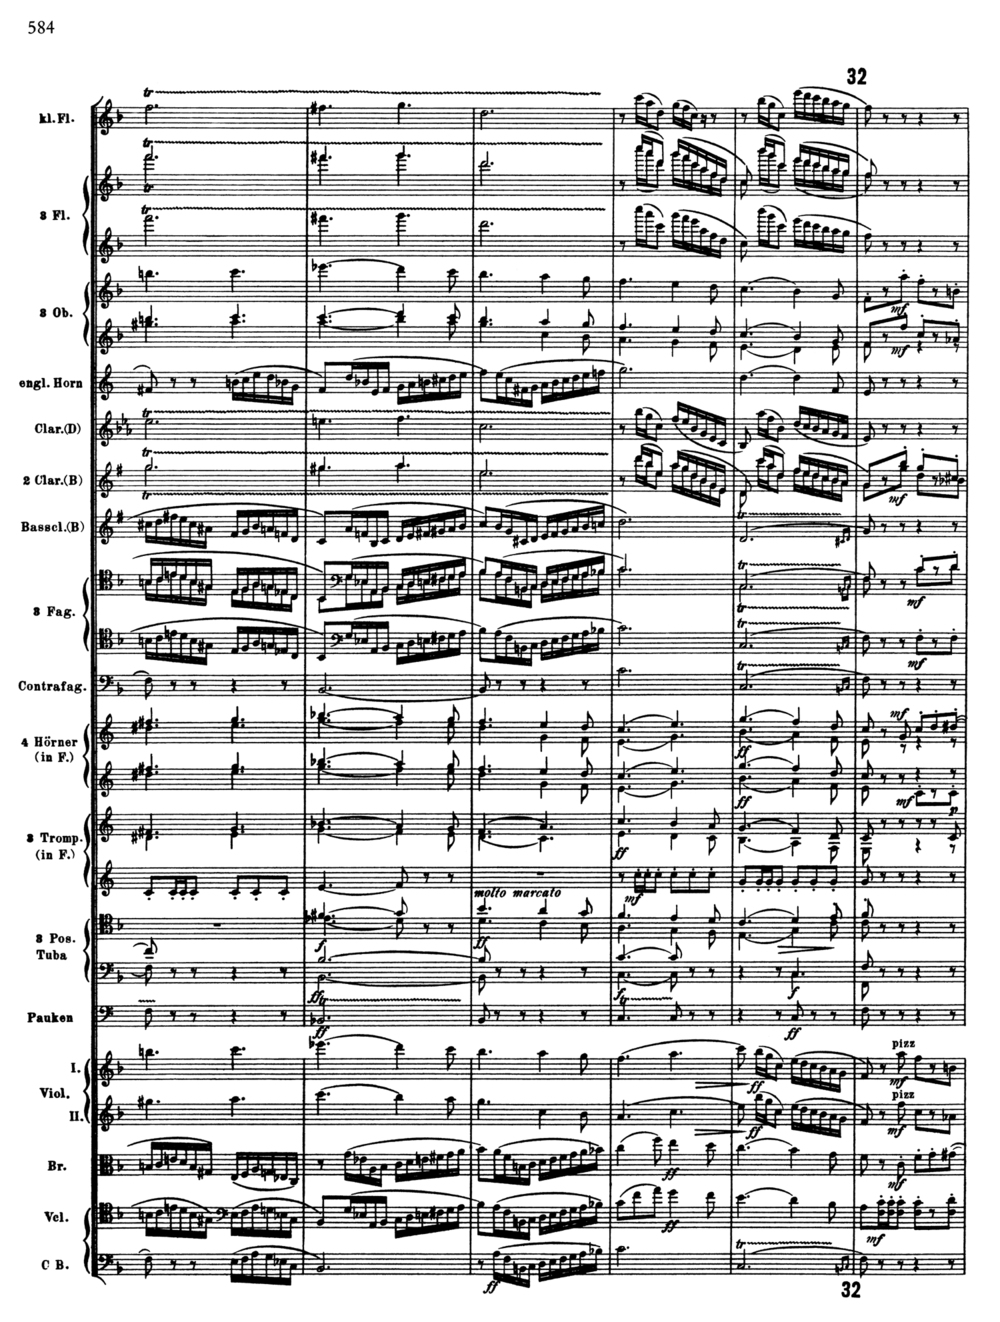 Strauss Till Eulenspiegel Score 2.jpg